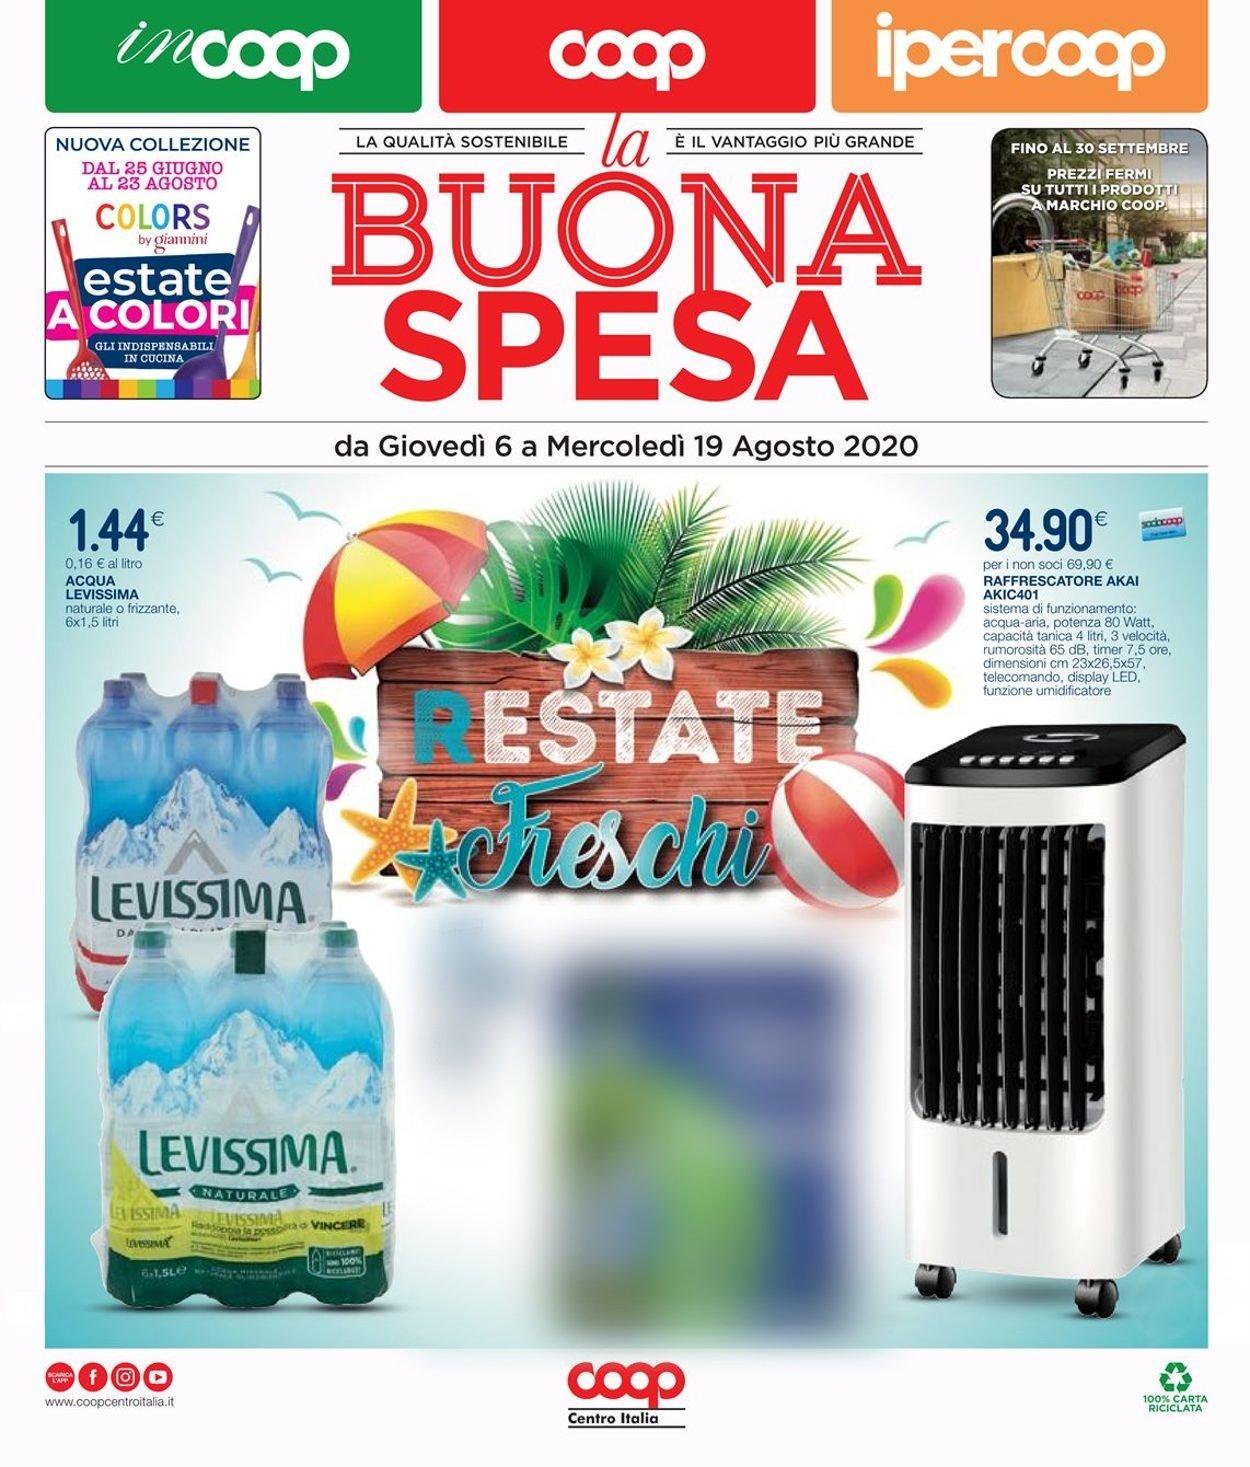 Volantino Coop - Offerte 06/08-19/08/2020